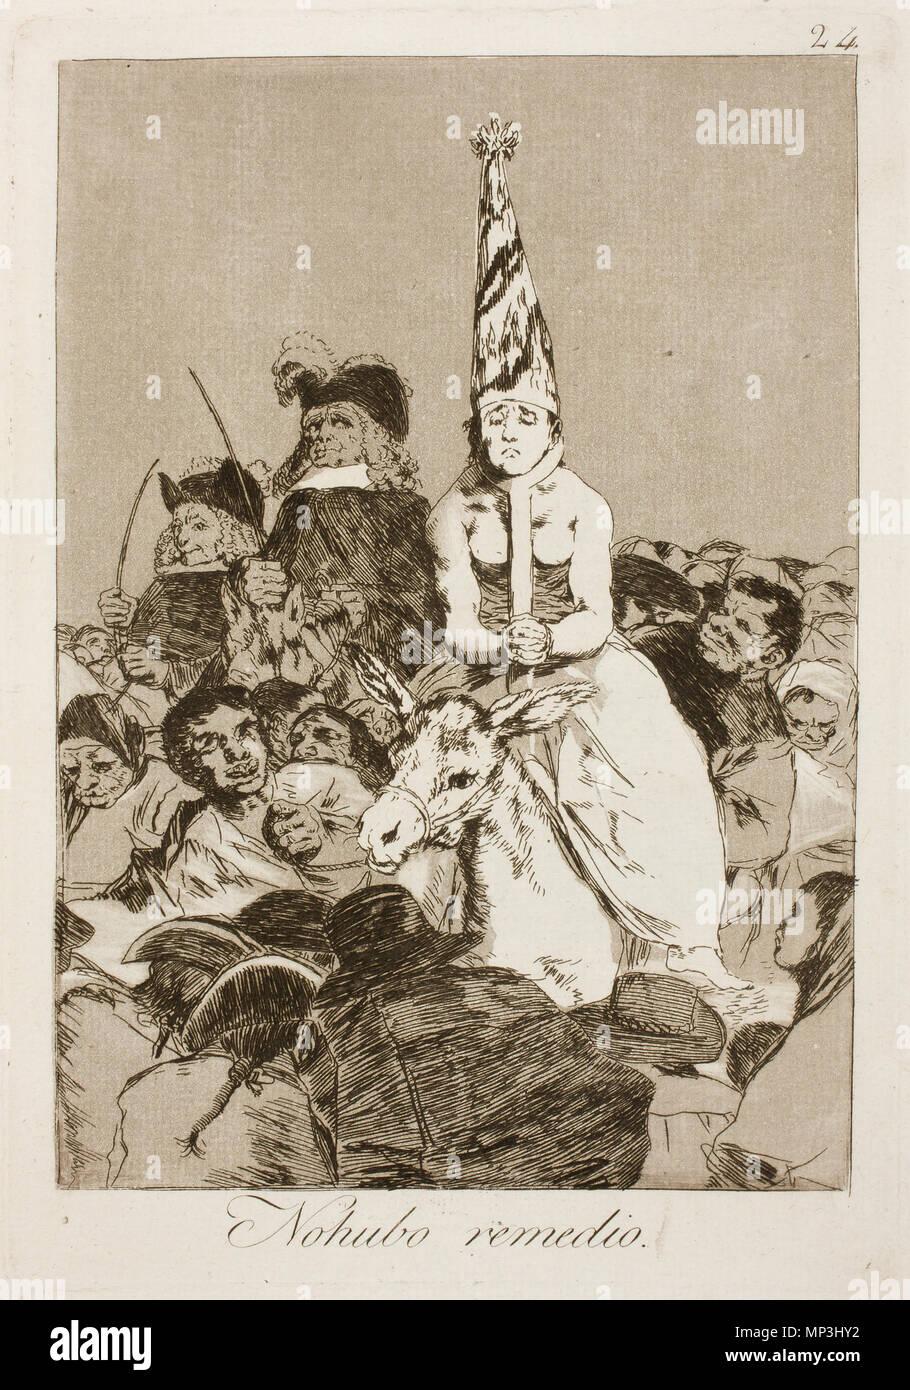 No hubo remedio (There was no help) . This print is work No. 24 of the 'Caprichos' series (1st edition, Madrid, 1799). 1797-1799.   913 Museo del Prado - Goya - Caprichos - No. 24 - No hubo remedio - Stock Image